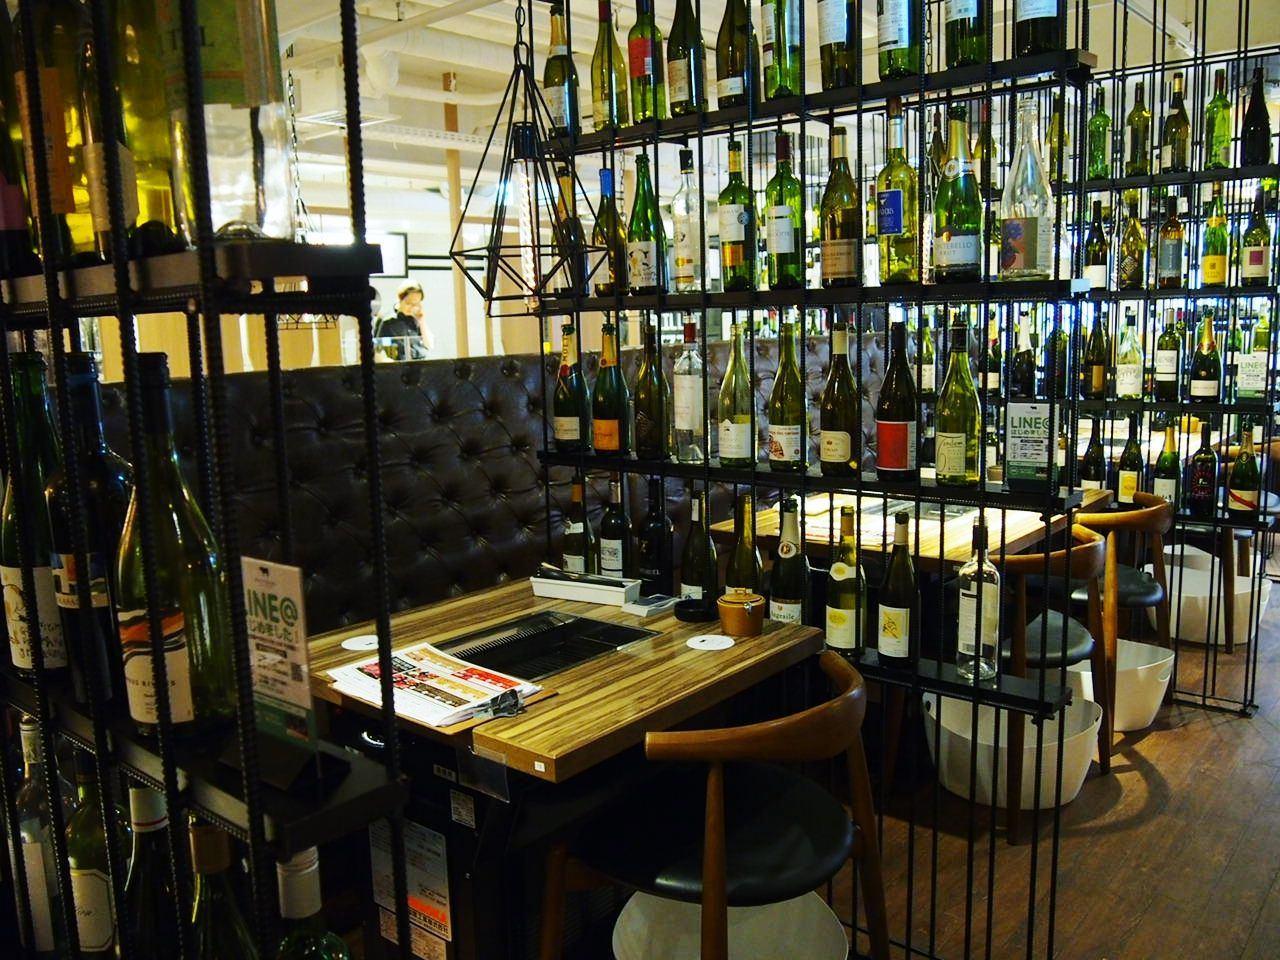 wine bottles serve as partitions between neighboring seats